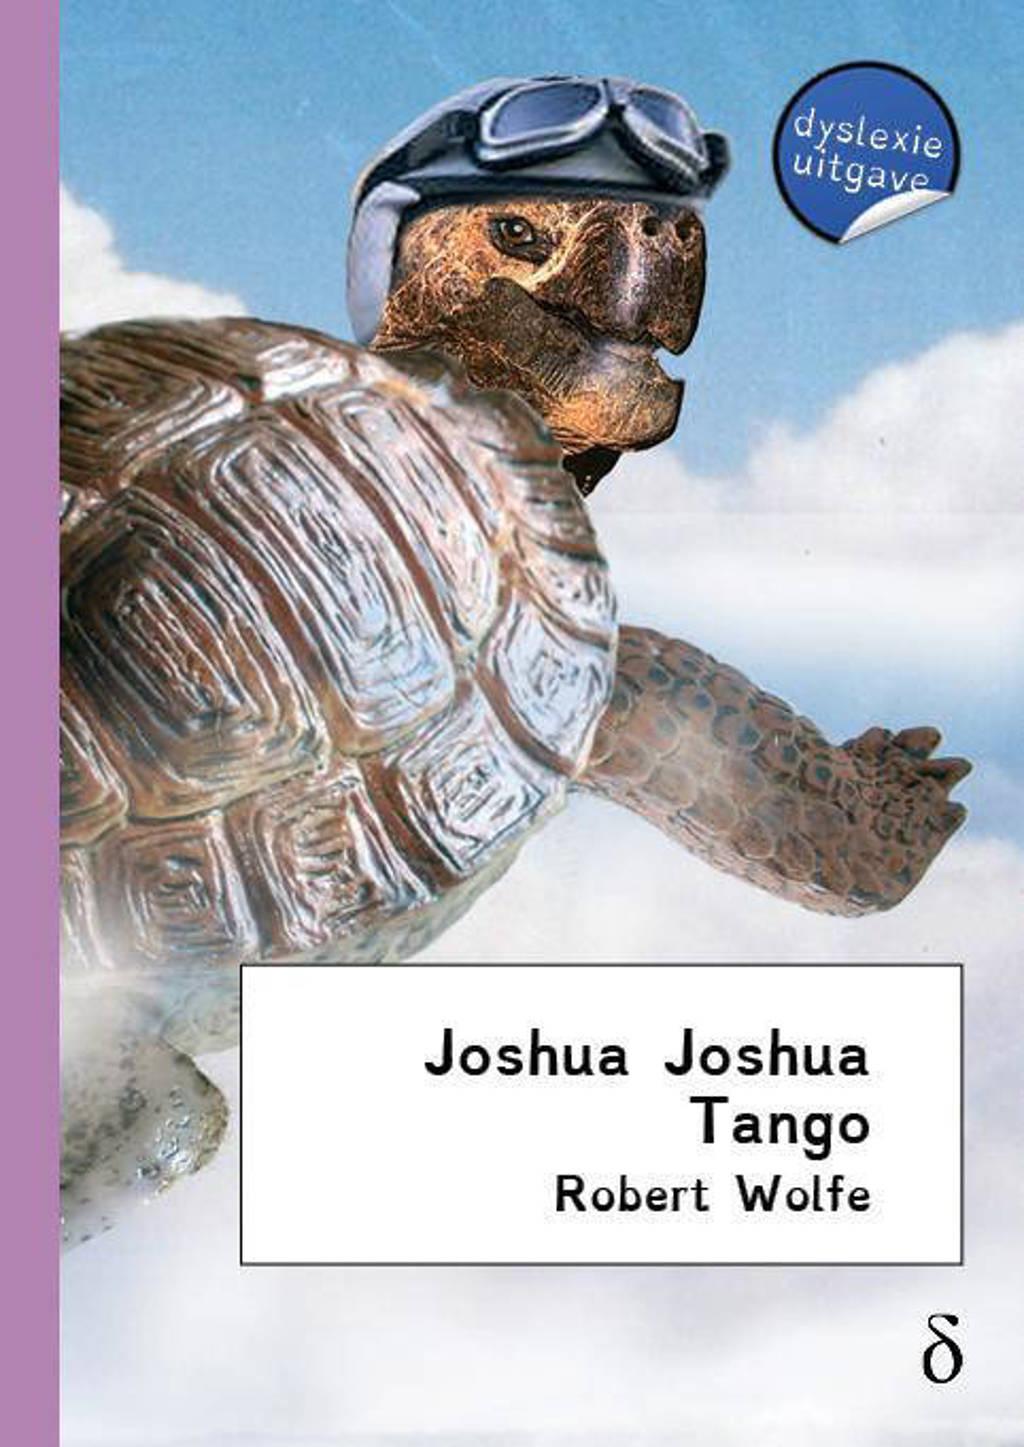 Joshua Joshua tango - Robert Wolfe